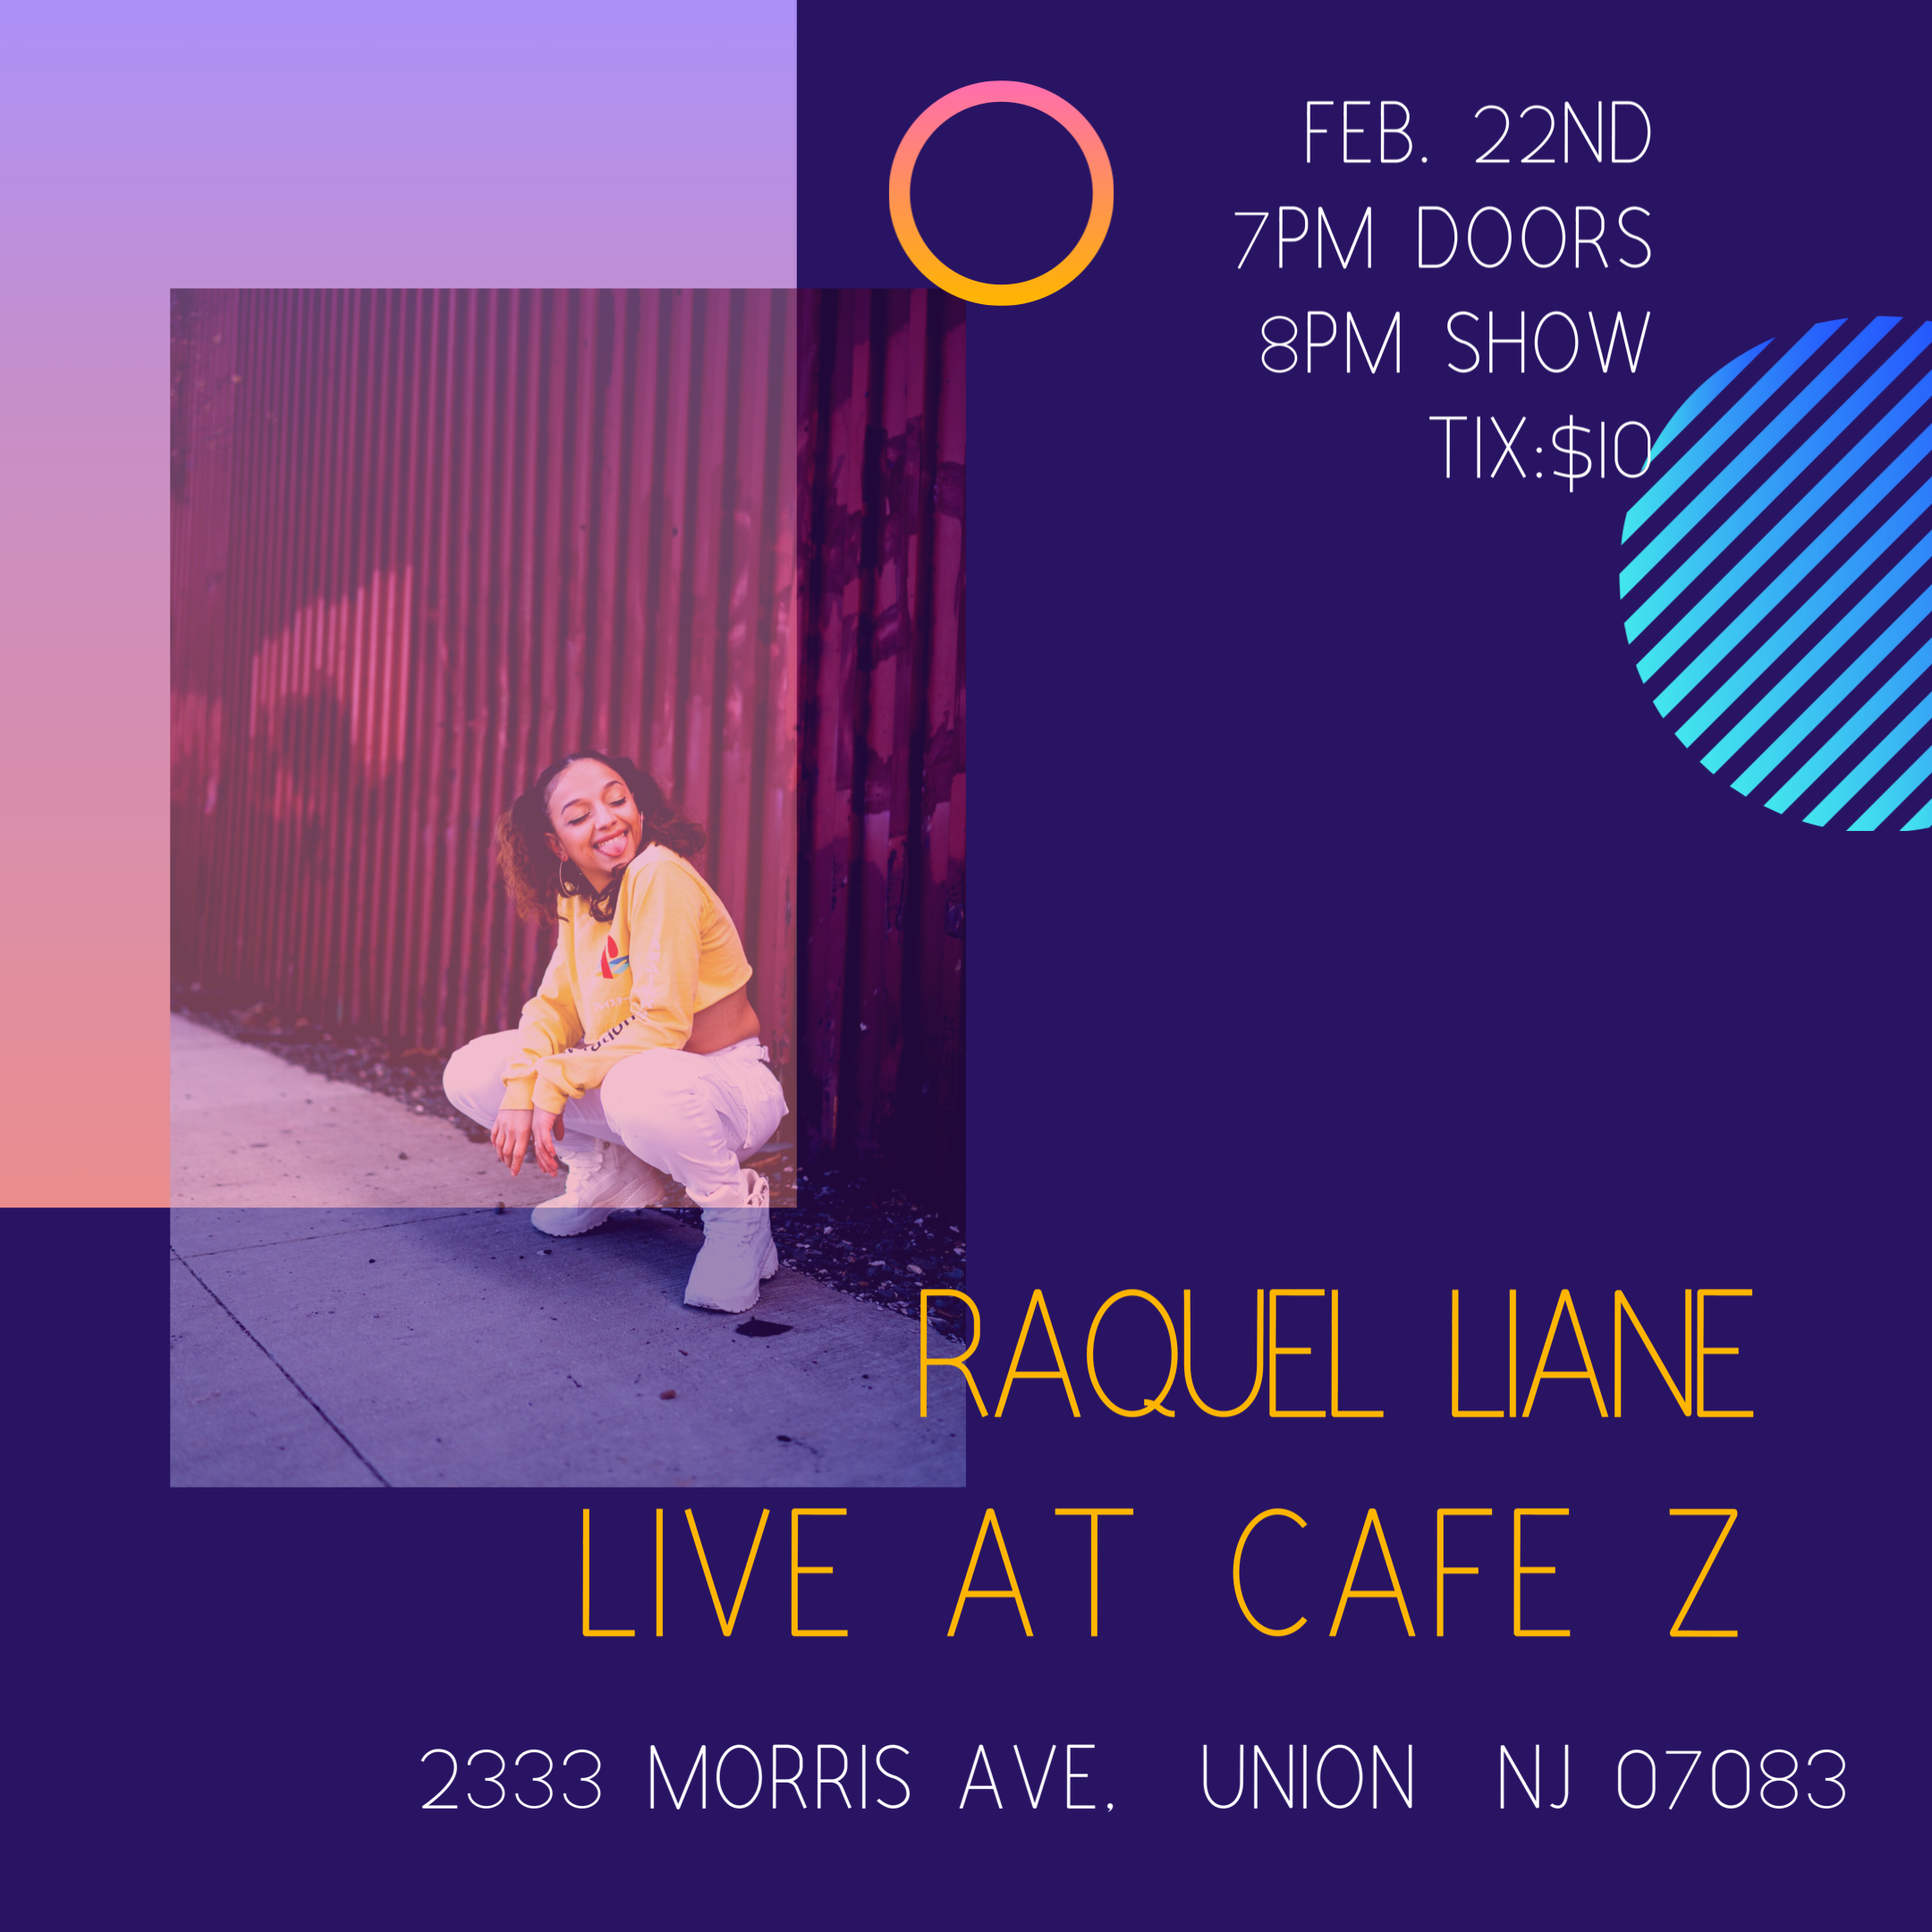 Raquel Liane Live at Cafe Z